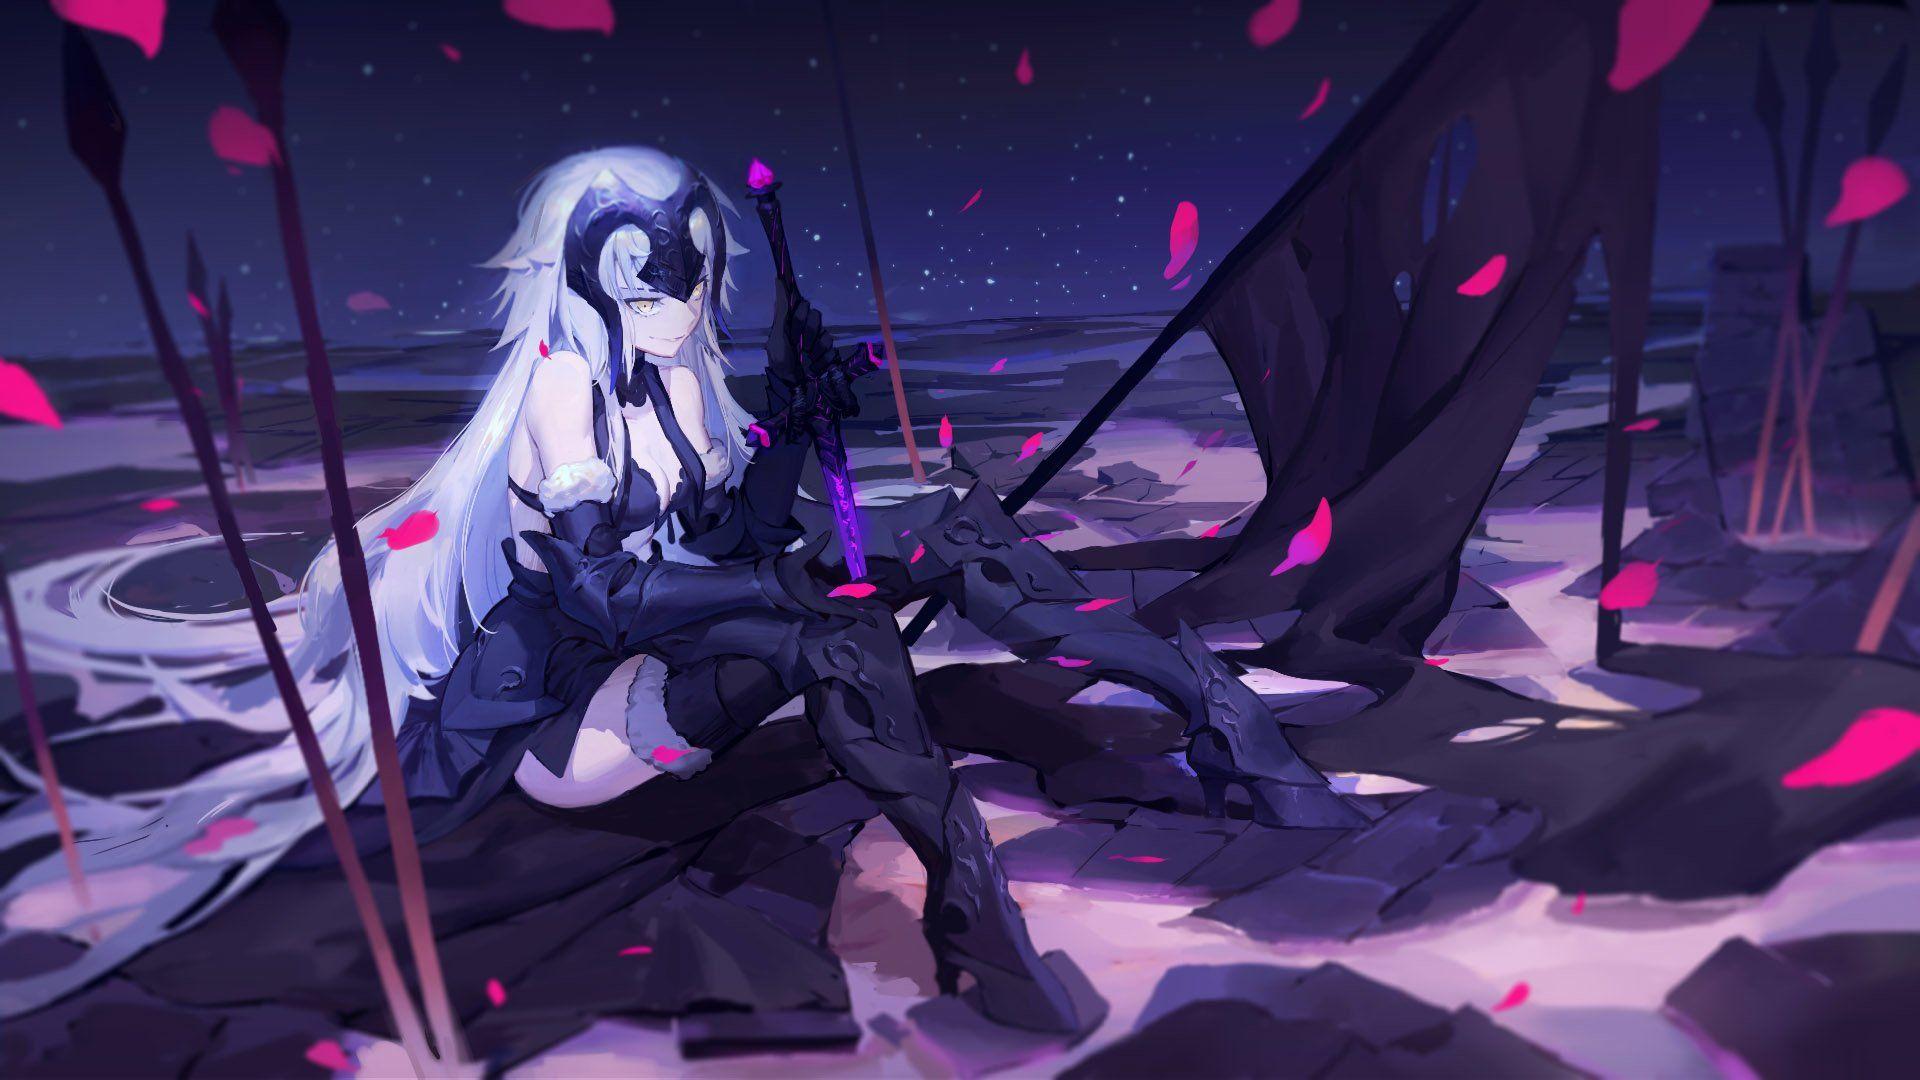 Anime Fate Grand Order Ruler Fate Apocrypha Avenger Fate Grand